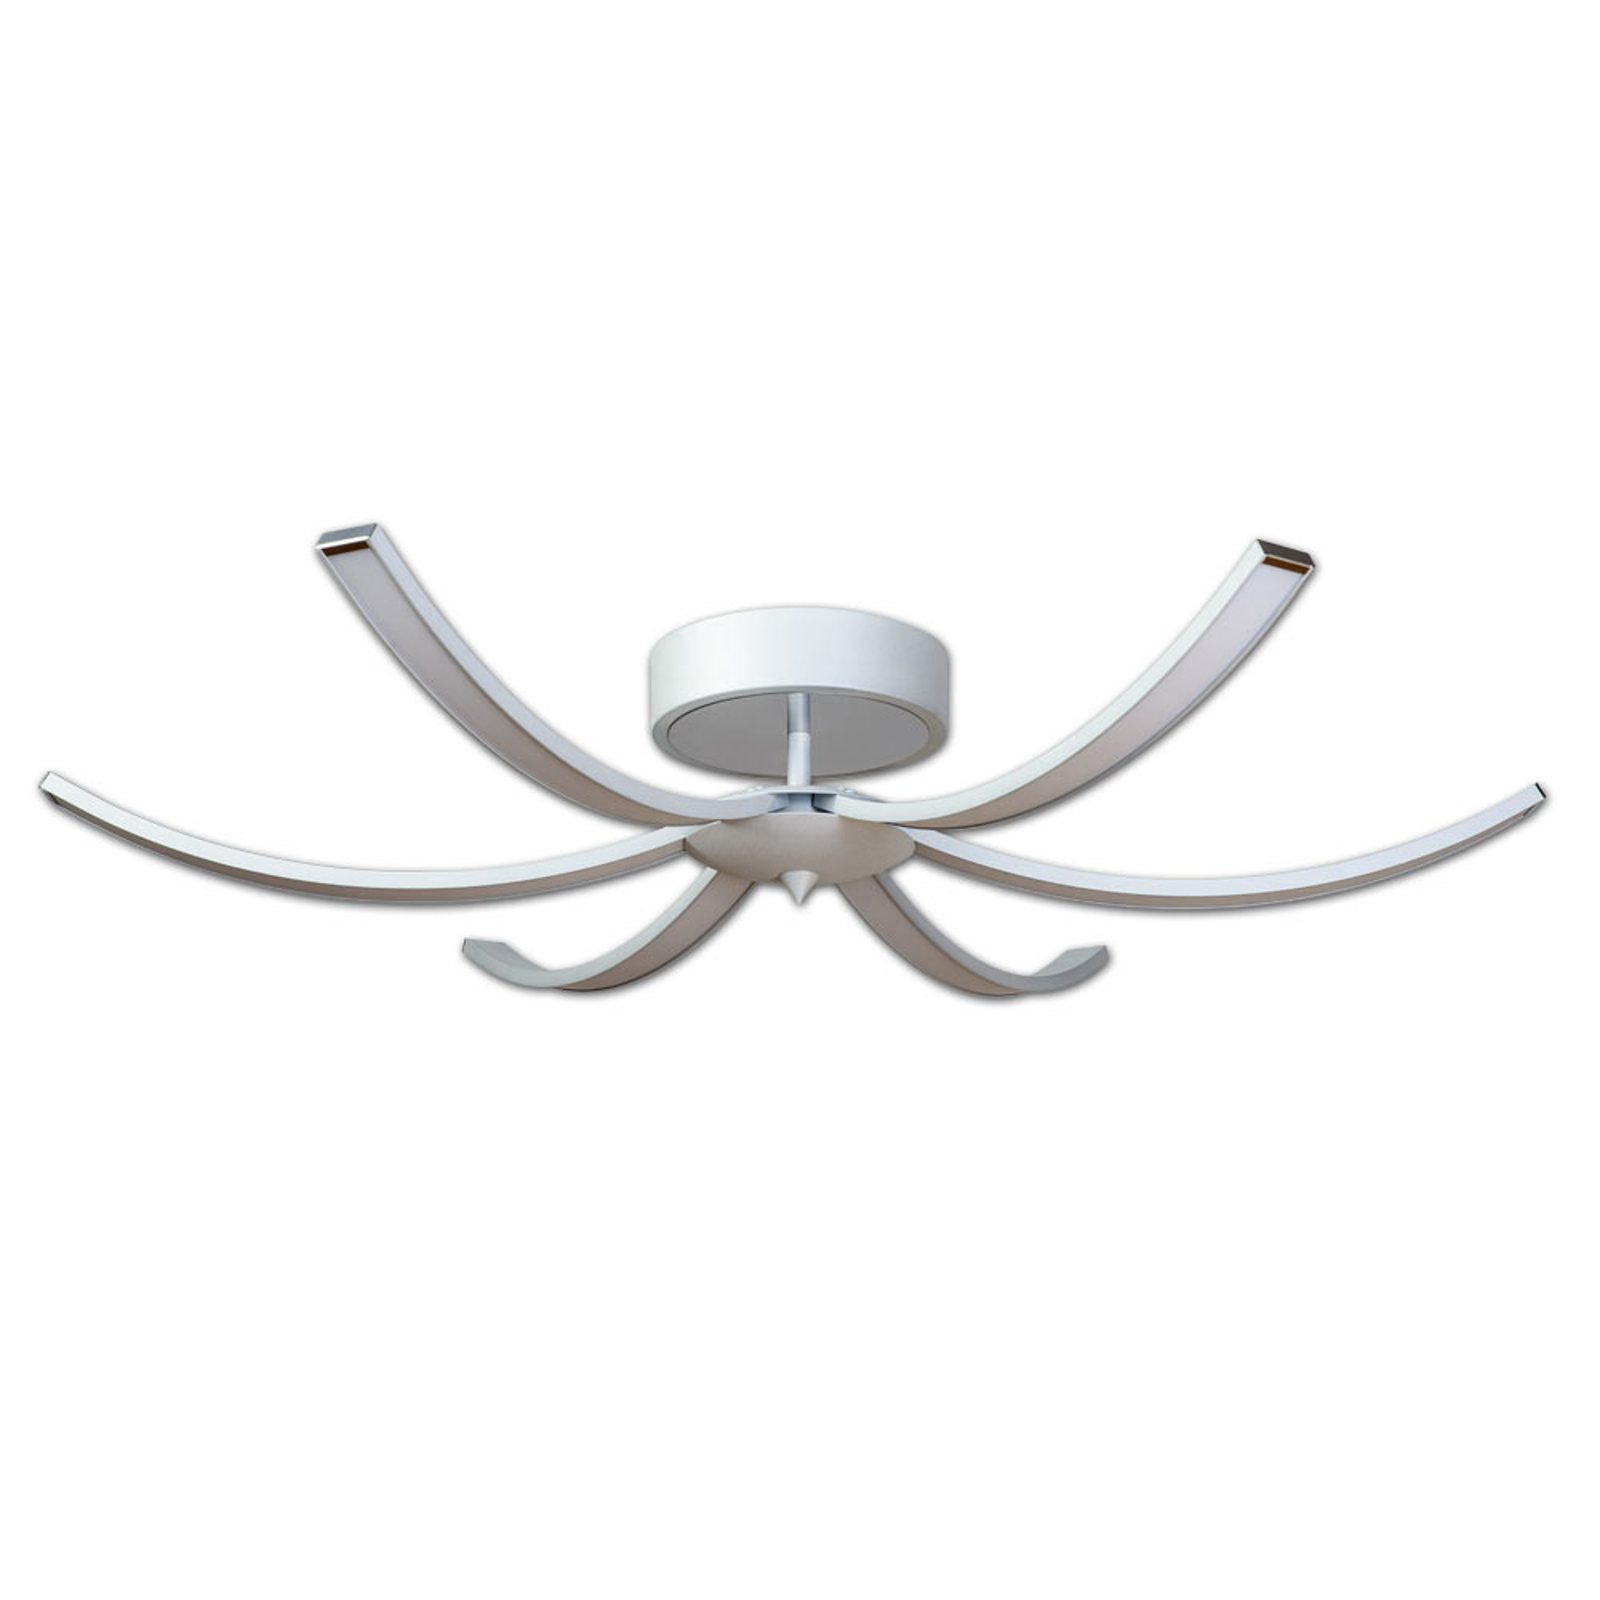 LED plafondlamp Largo 91 cm